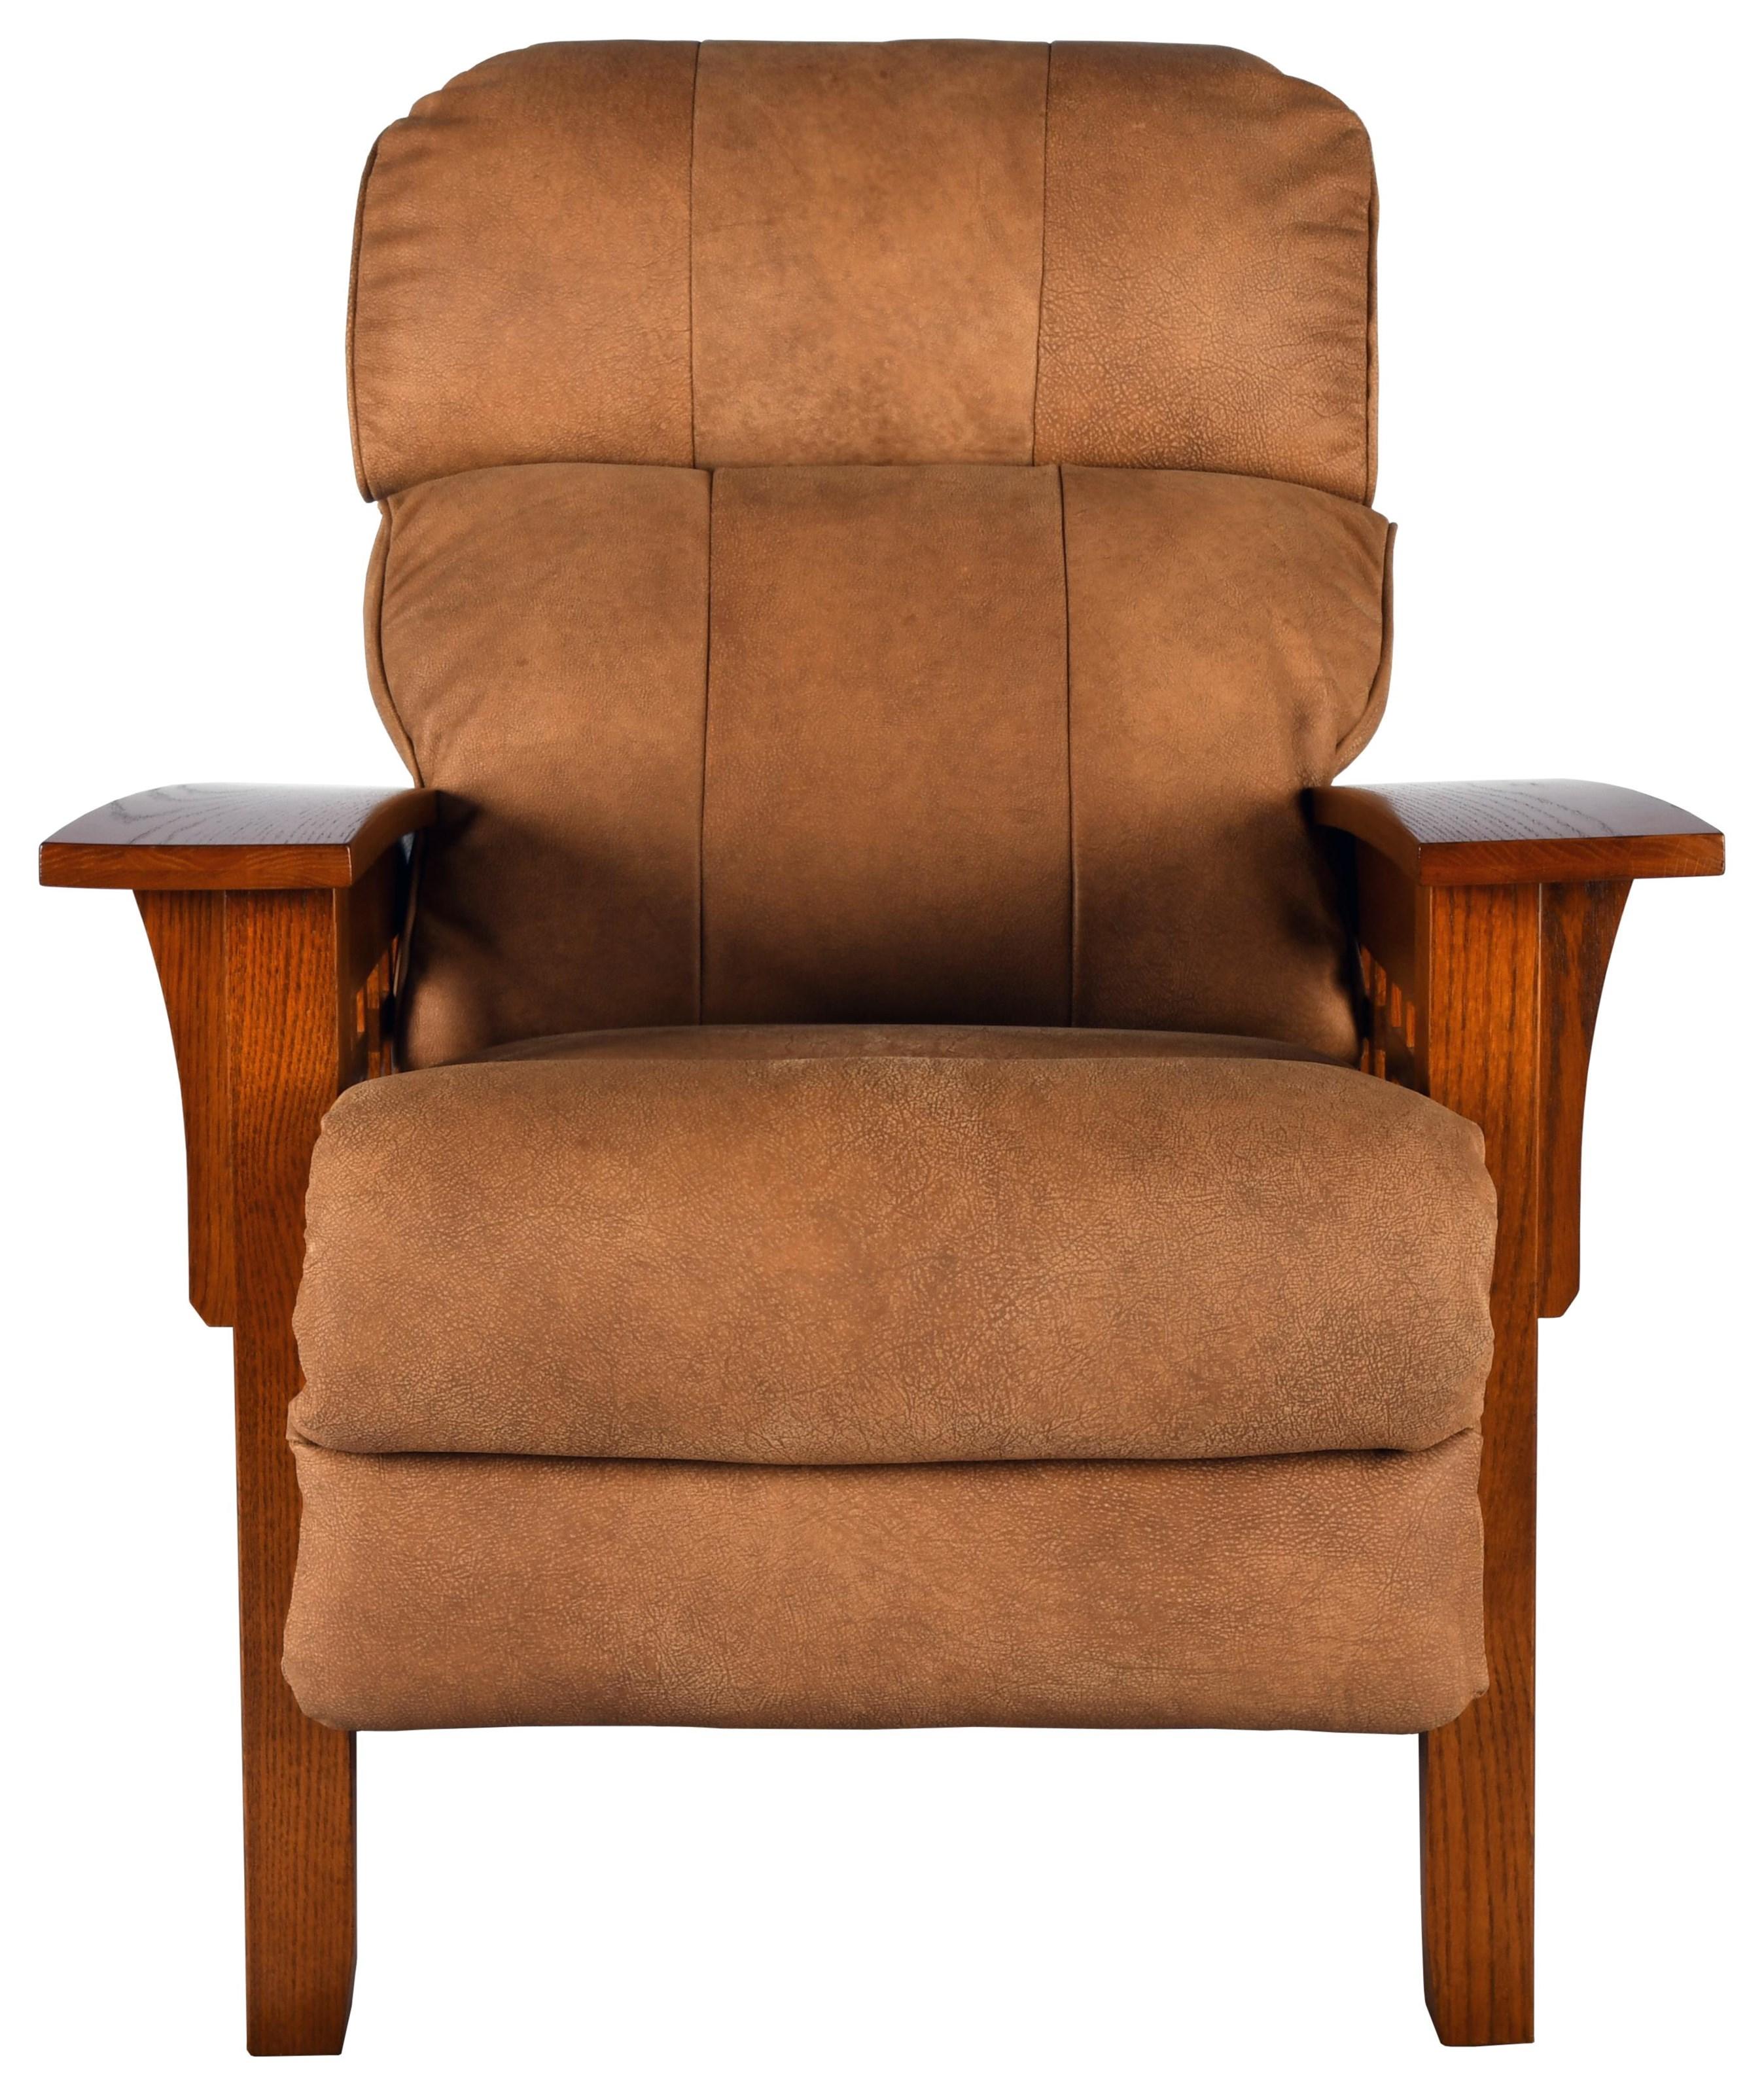 Eldorado High Leg Leather Recliner by La-Z-Boy at Bennett's Furniture and Mattresses